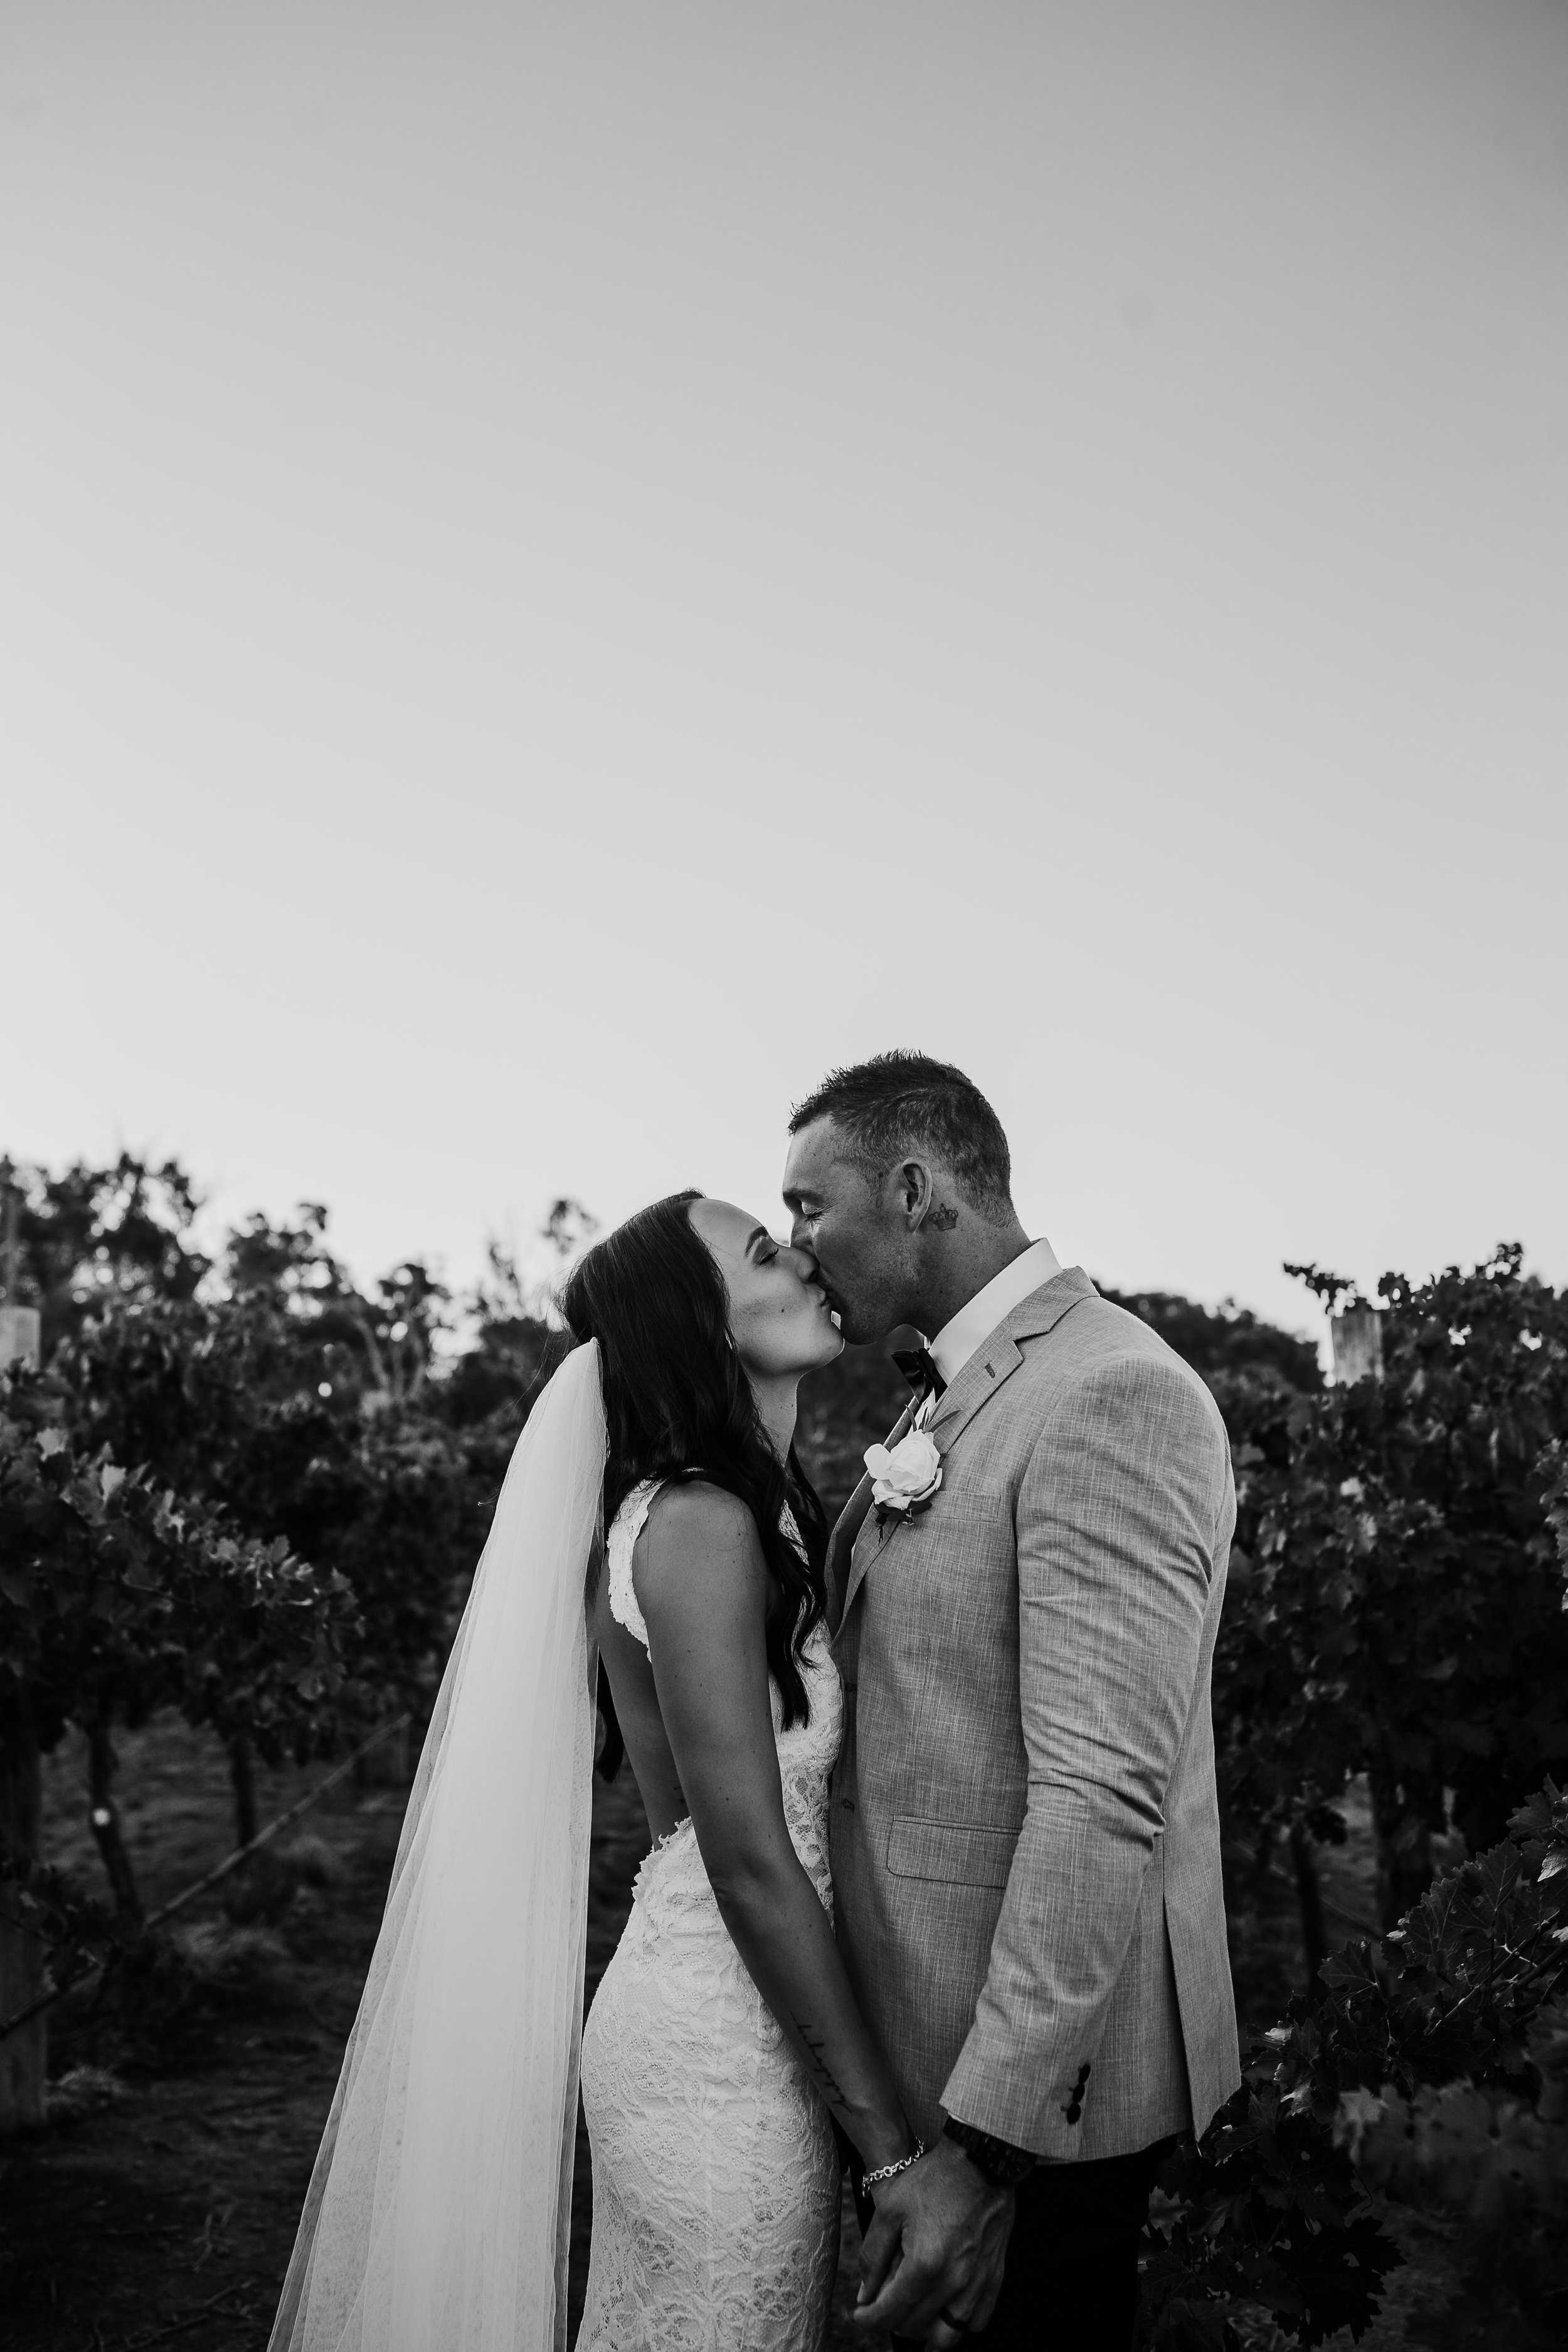 mickalathomas_puremacphotography_weddingphotographer_couplephotographer_Sheppartonphotographer_2912.jpg